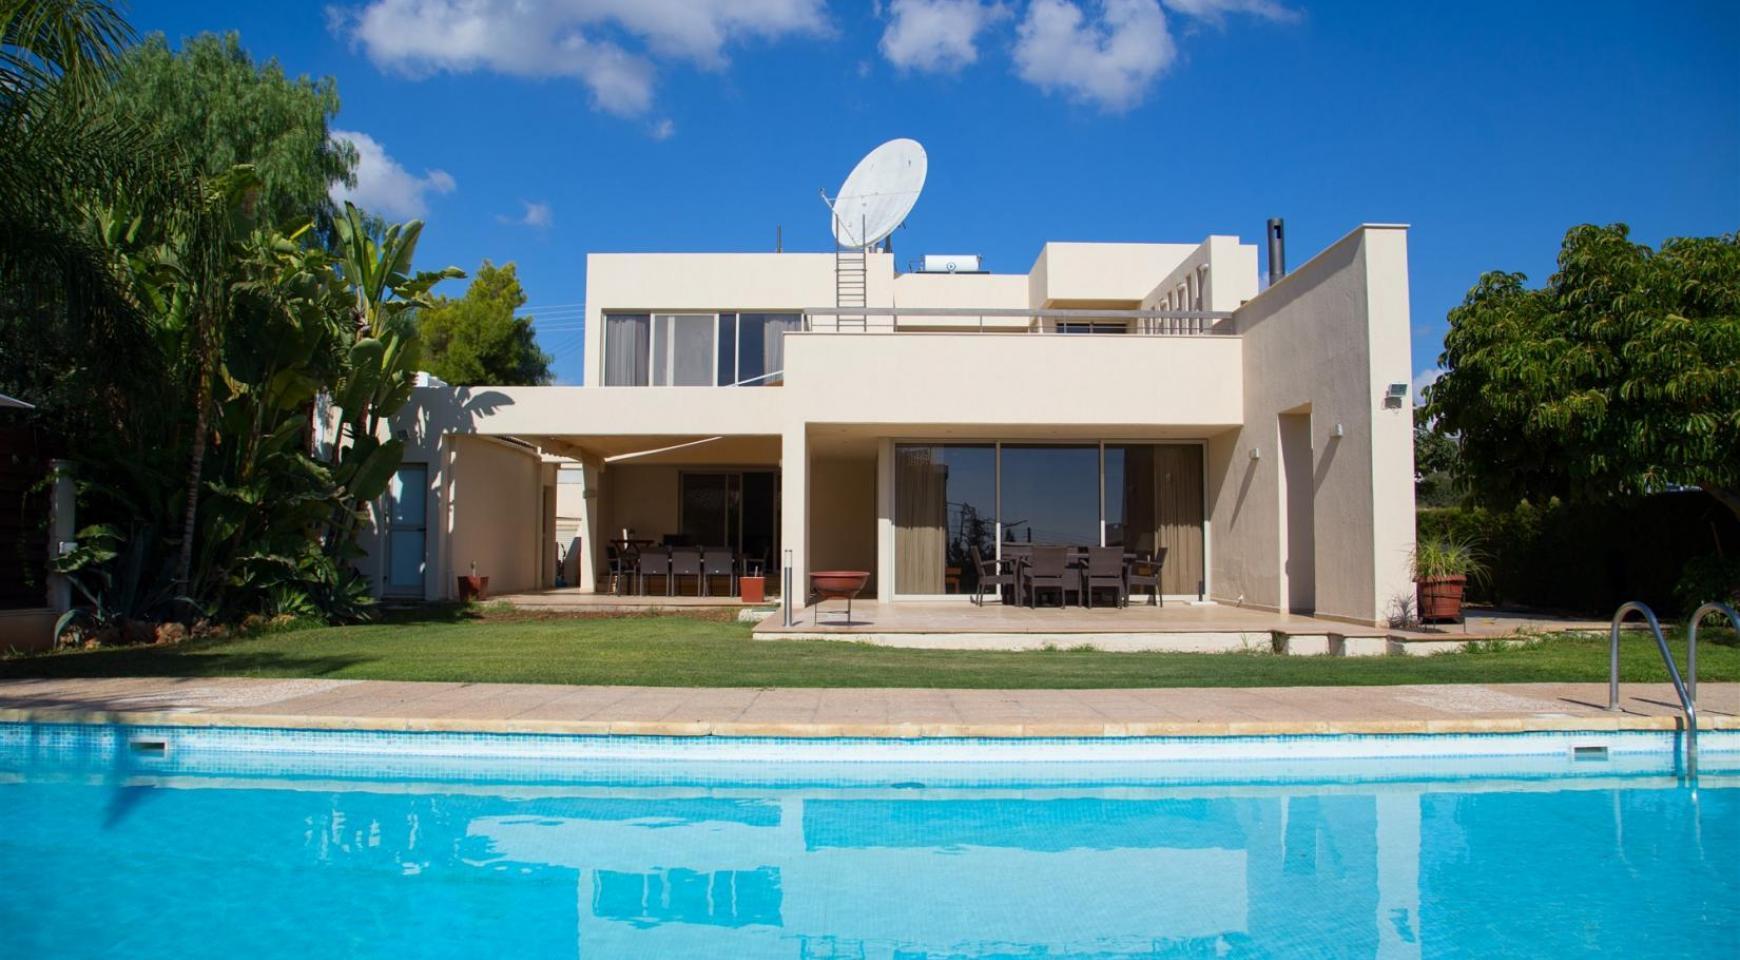 Modern Luxury 4 Bedroom Villa in Sfalagiotisa, Agios Athanasios - 2